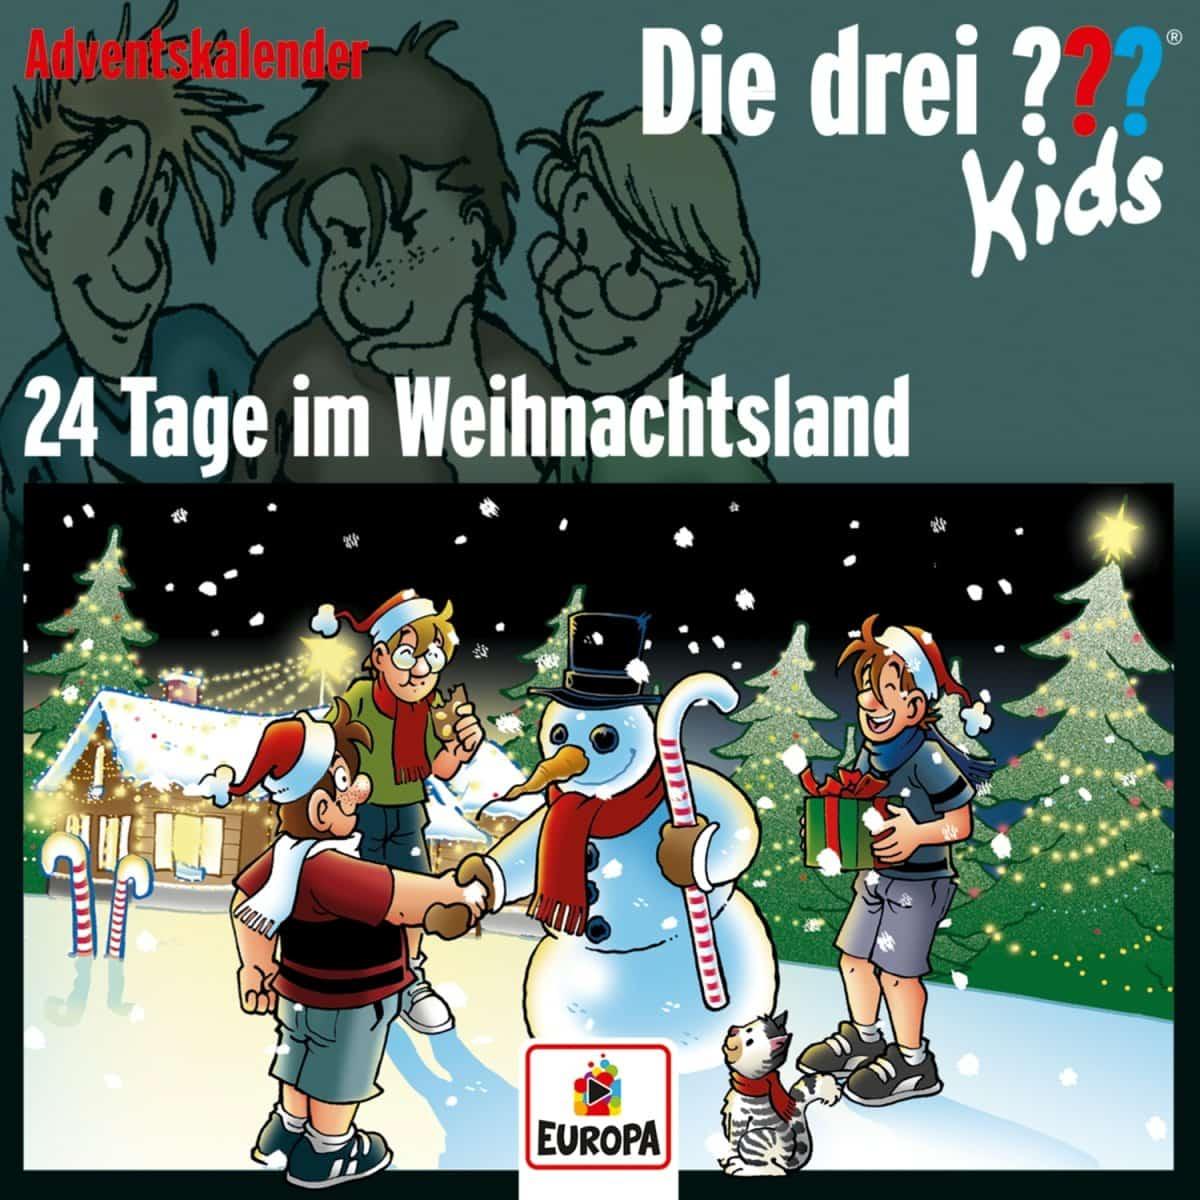 Die drei Kids - Hörbuch-Adventskalender